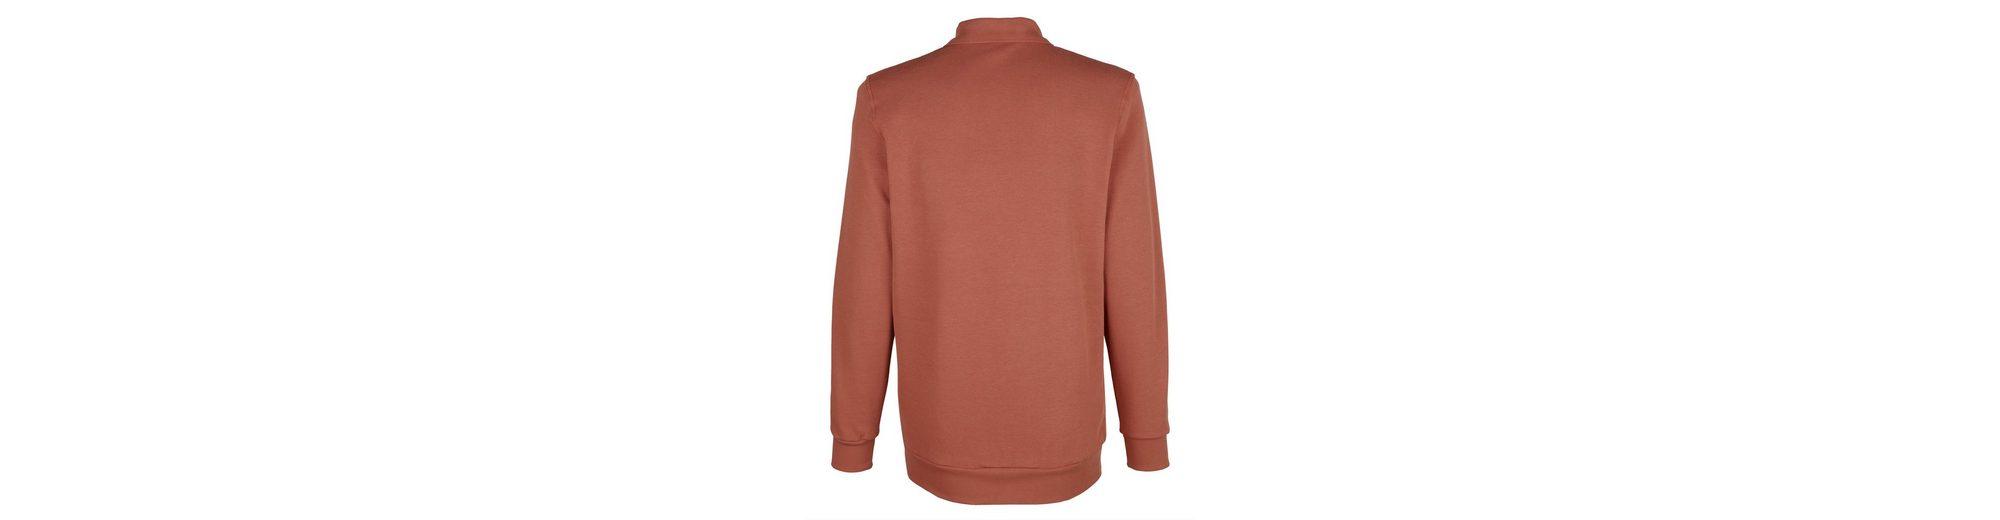 Polokragen Roger Kent Roger Kent Sweatshirt Sweatshirt mit mit 0Bfxdqdw